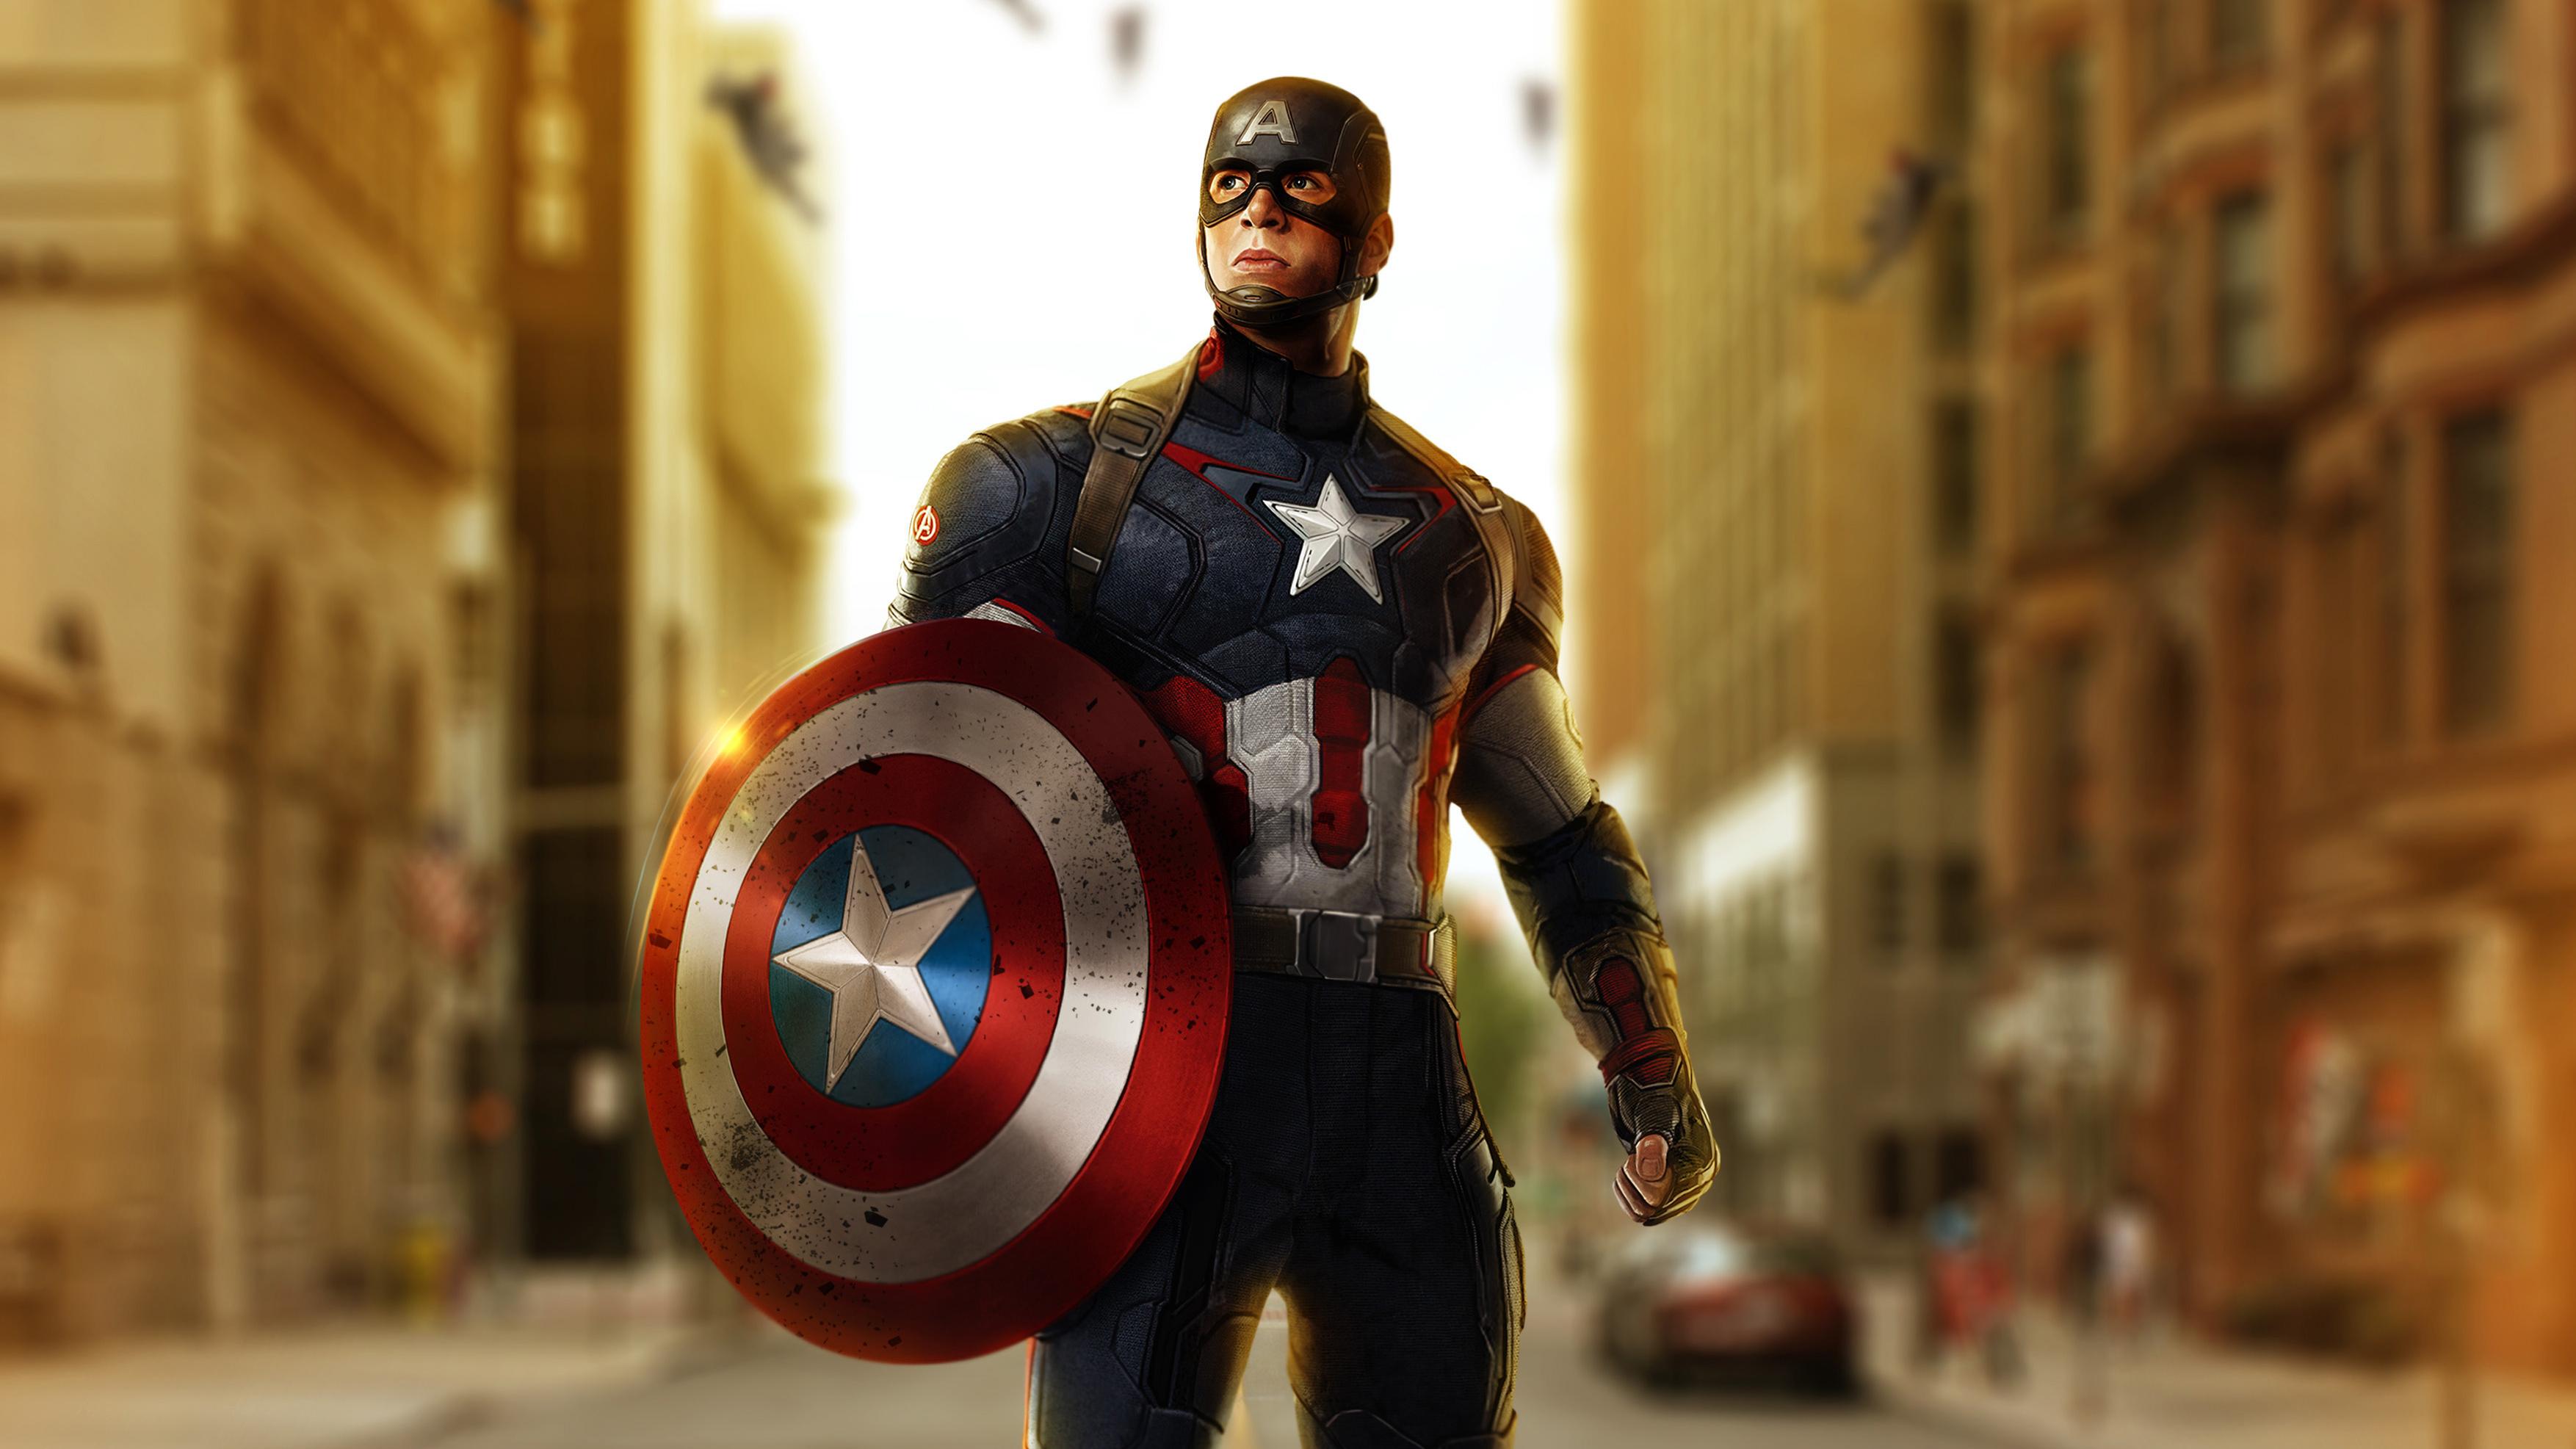 Avengers Age Of Ultron Captain America Artwork Hd